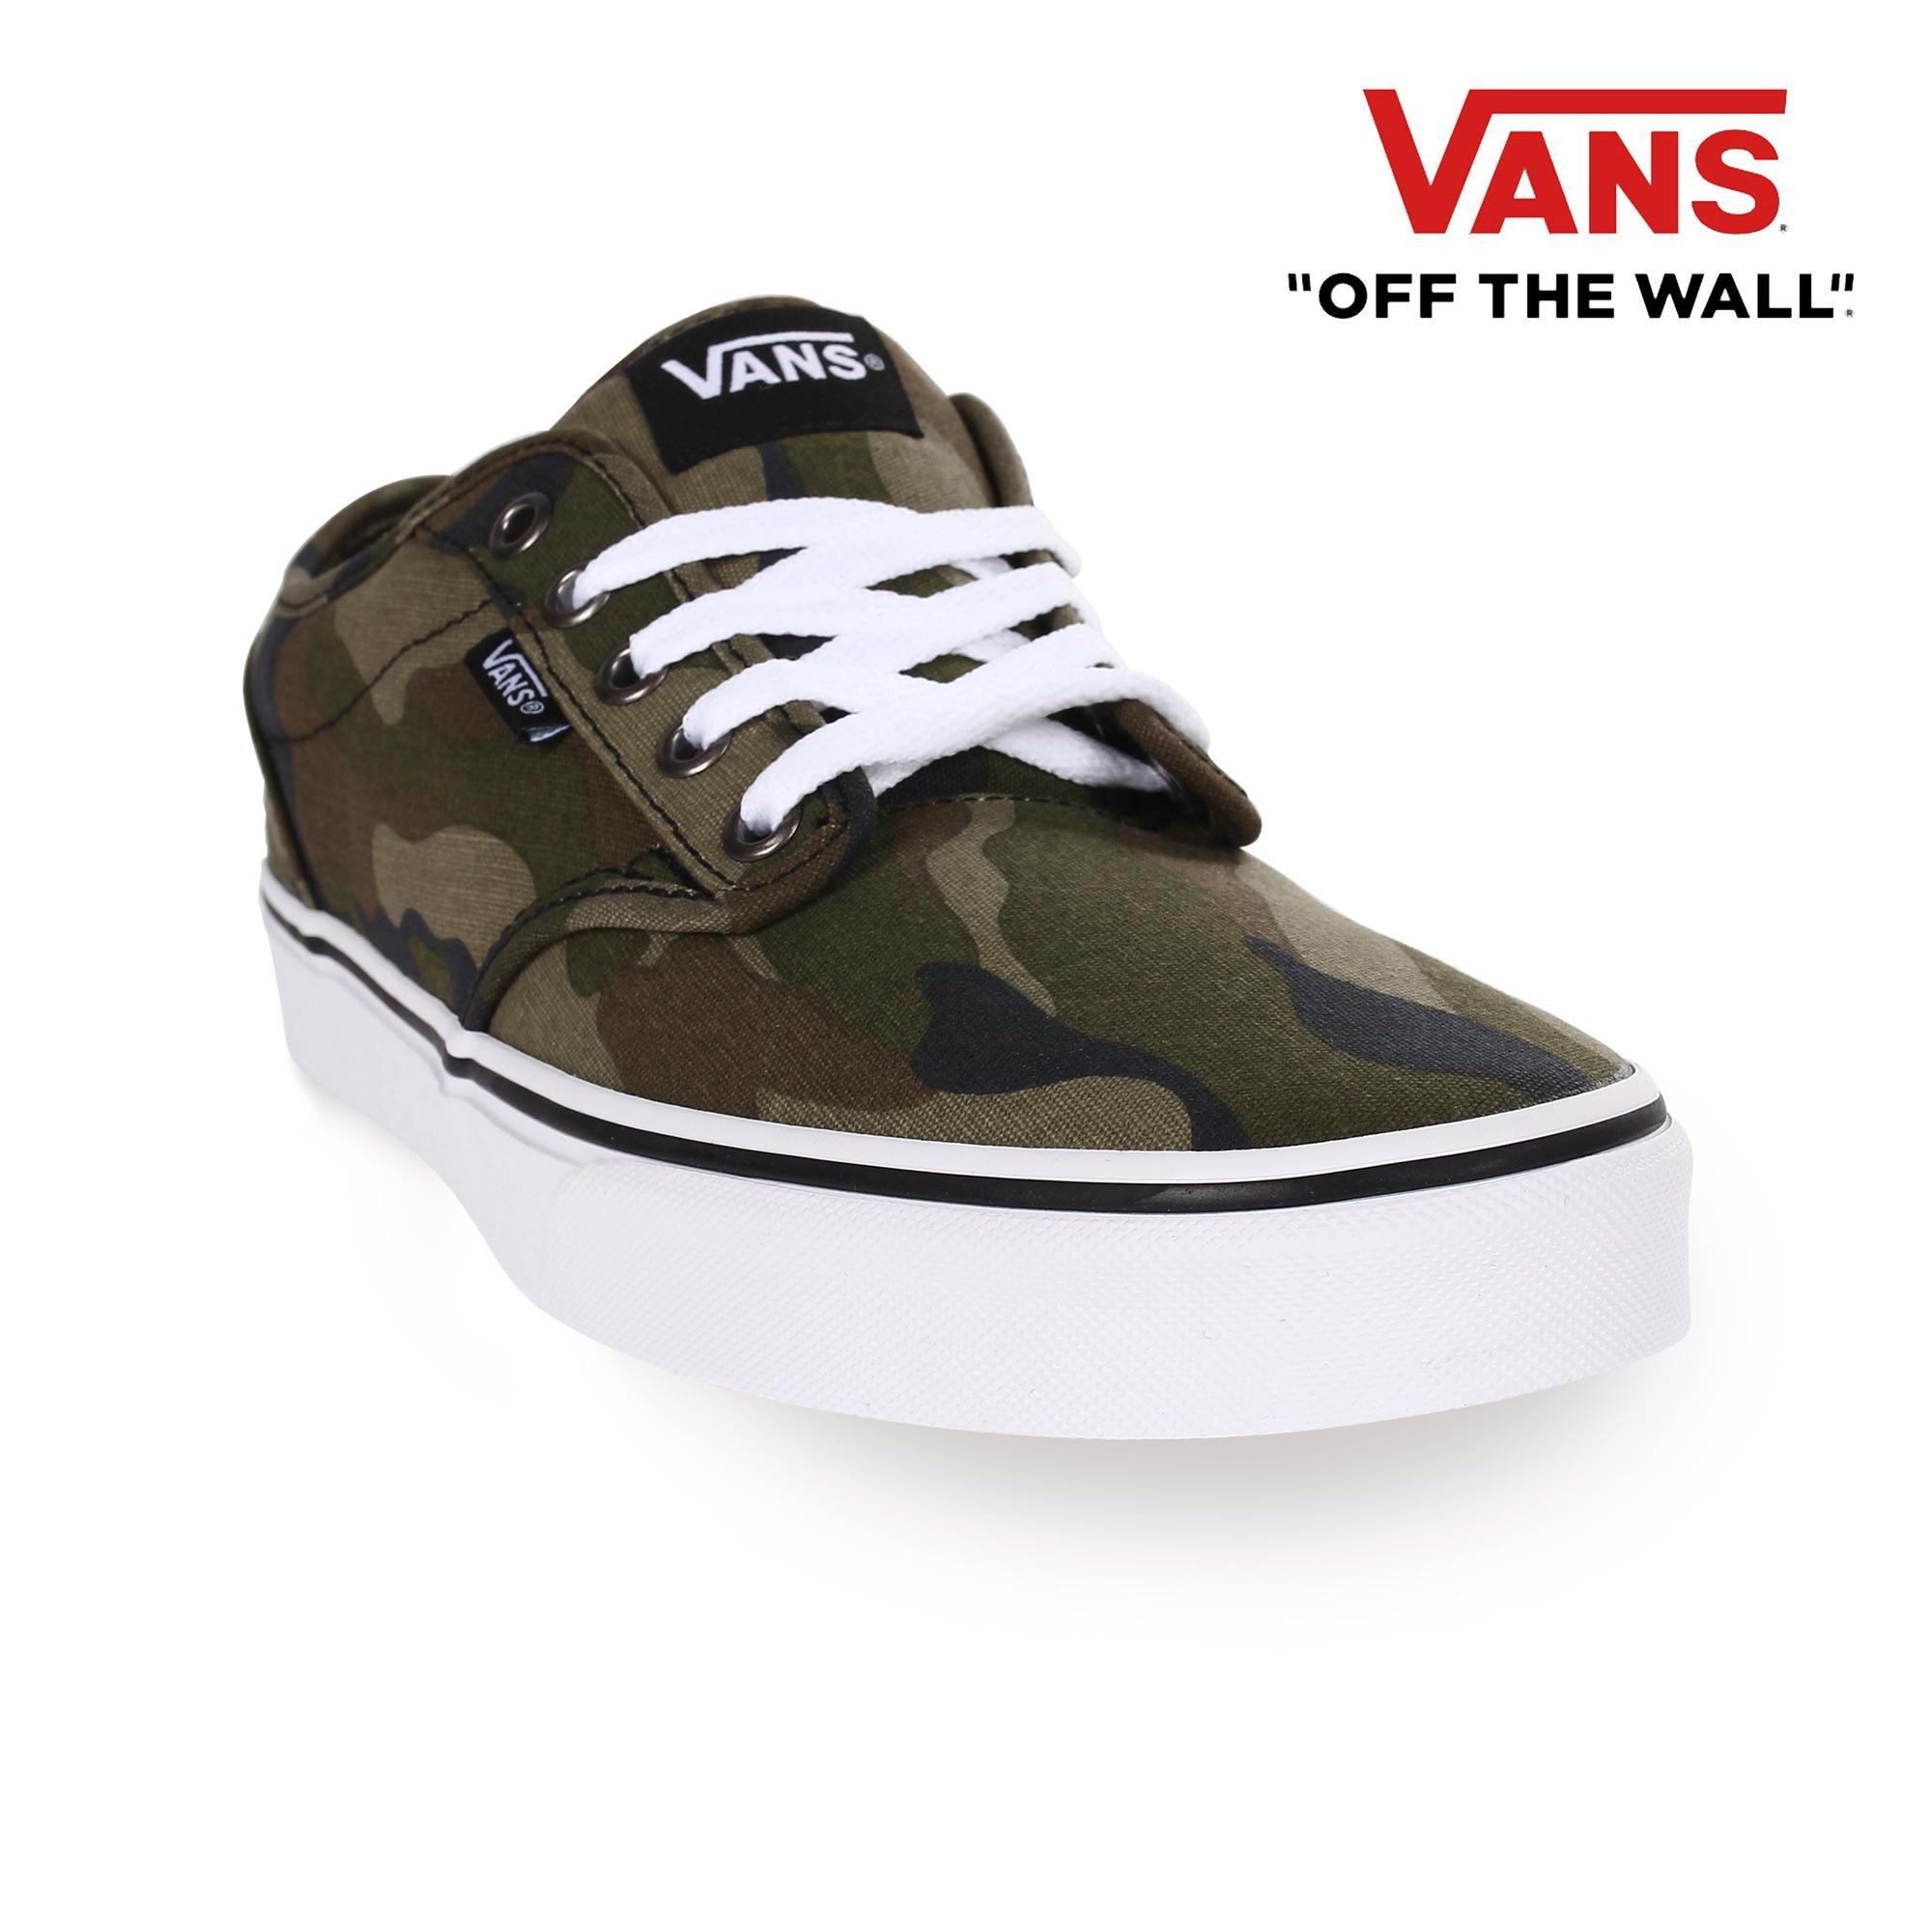 2350abe700 Vans Shoes for Men Philippines - Vans Men s Shoes for sale - prices ...